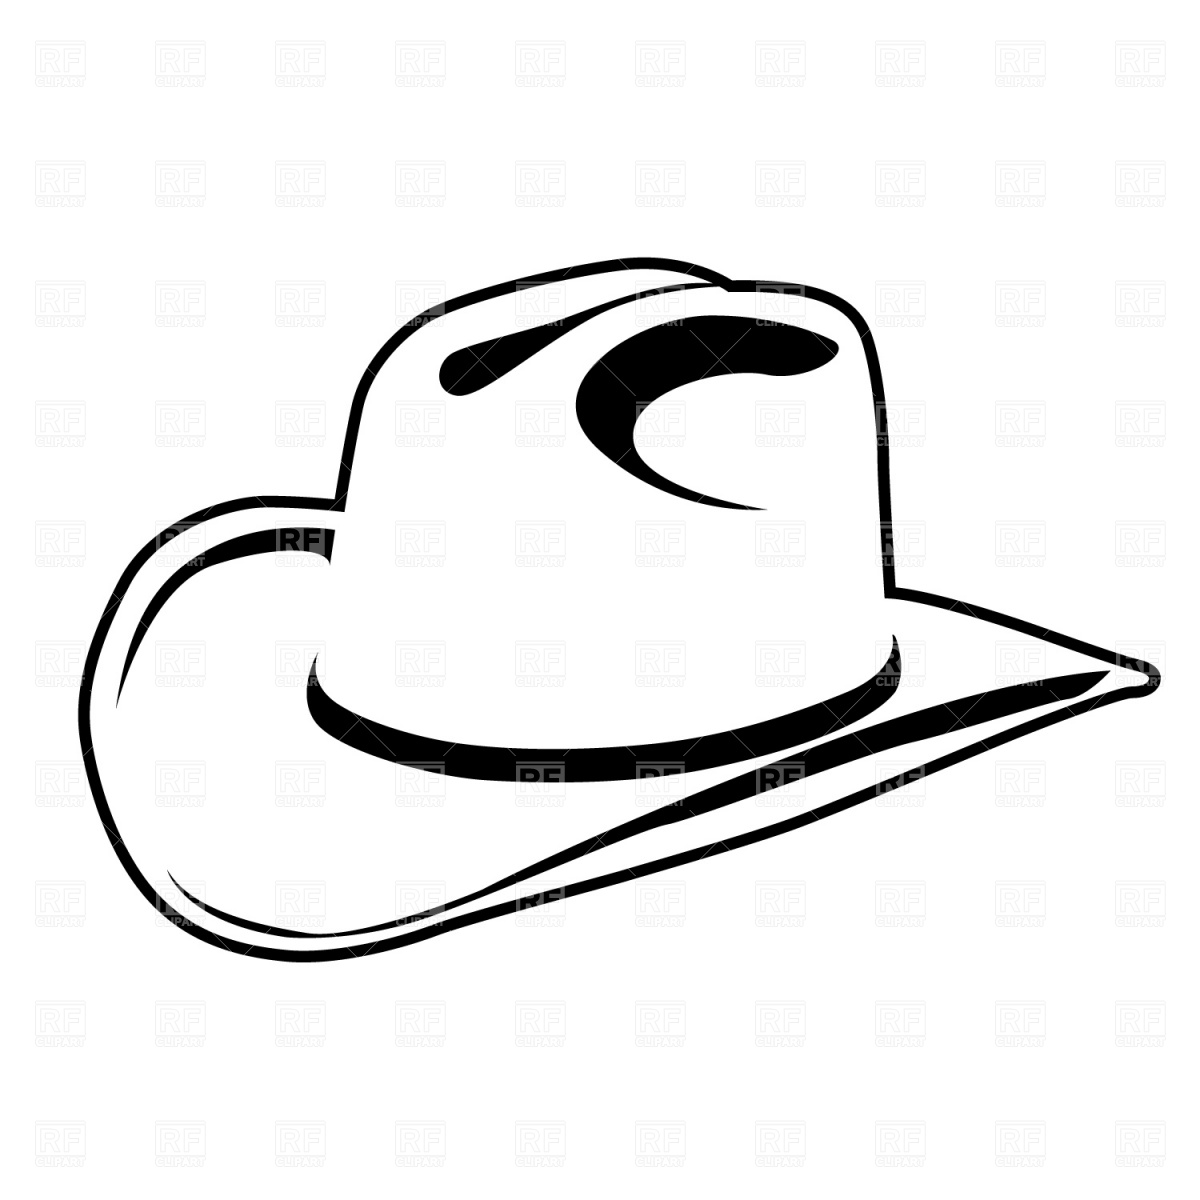 1200x1200 Silhouette Of Cowboy On Horseback